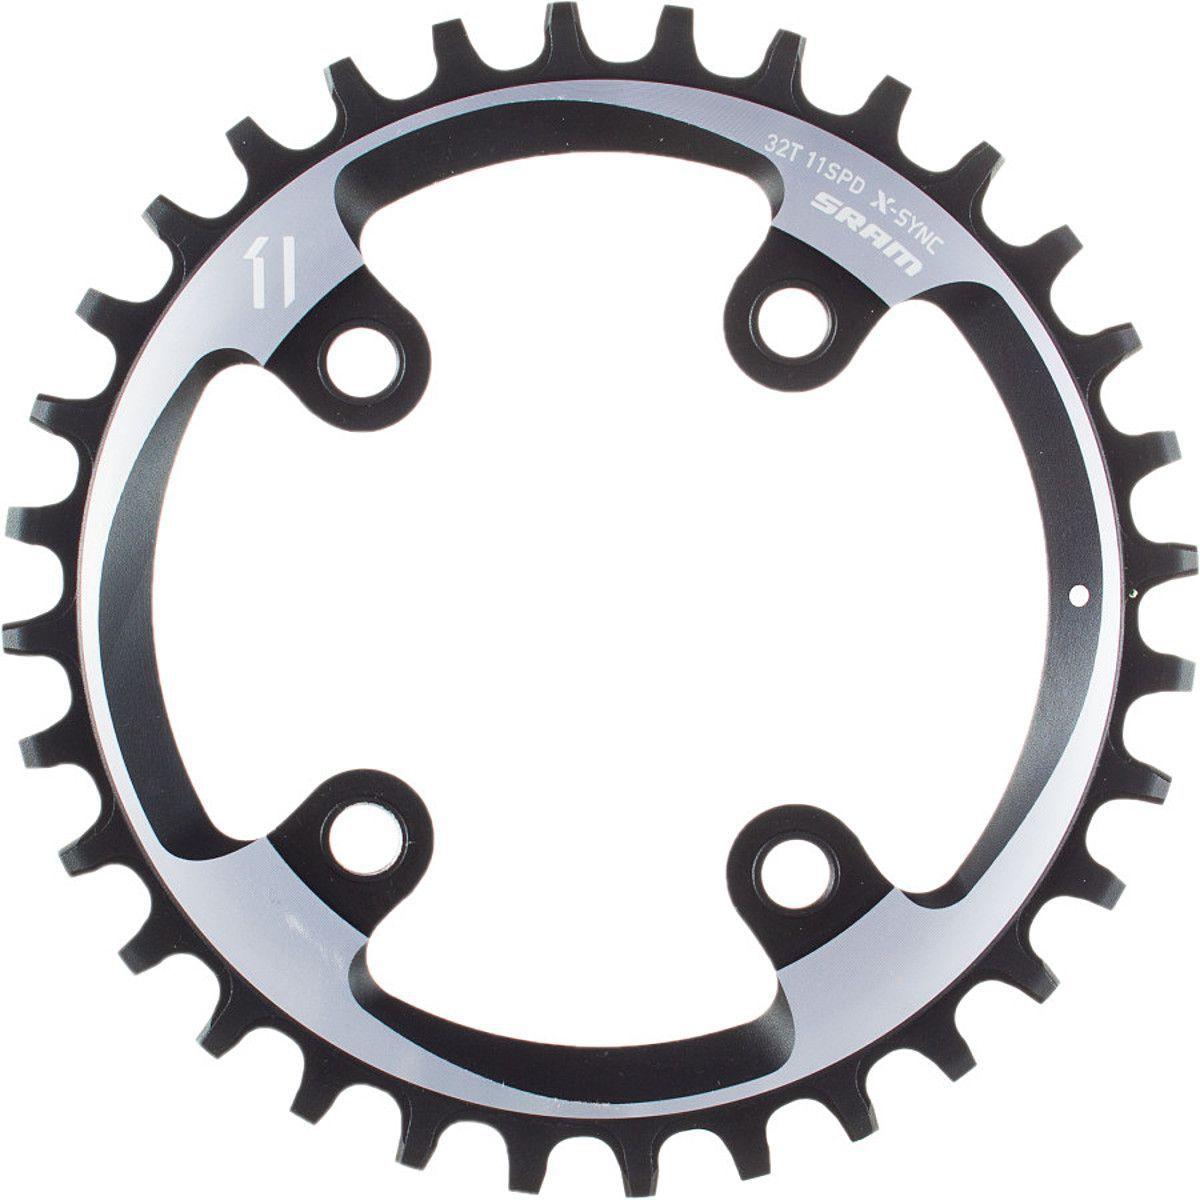 Coroa Bicicleta Sram Xx1 32t Bcd 76mm X-sync Para Uso 1x11